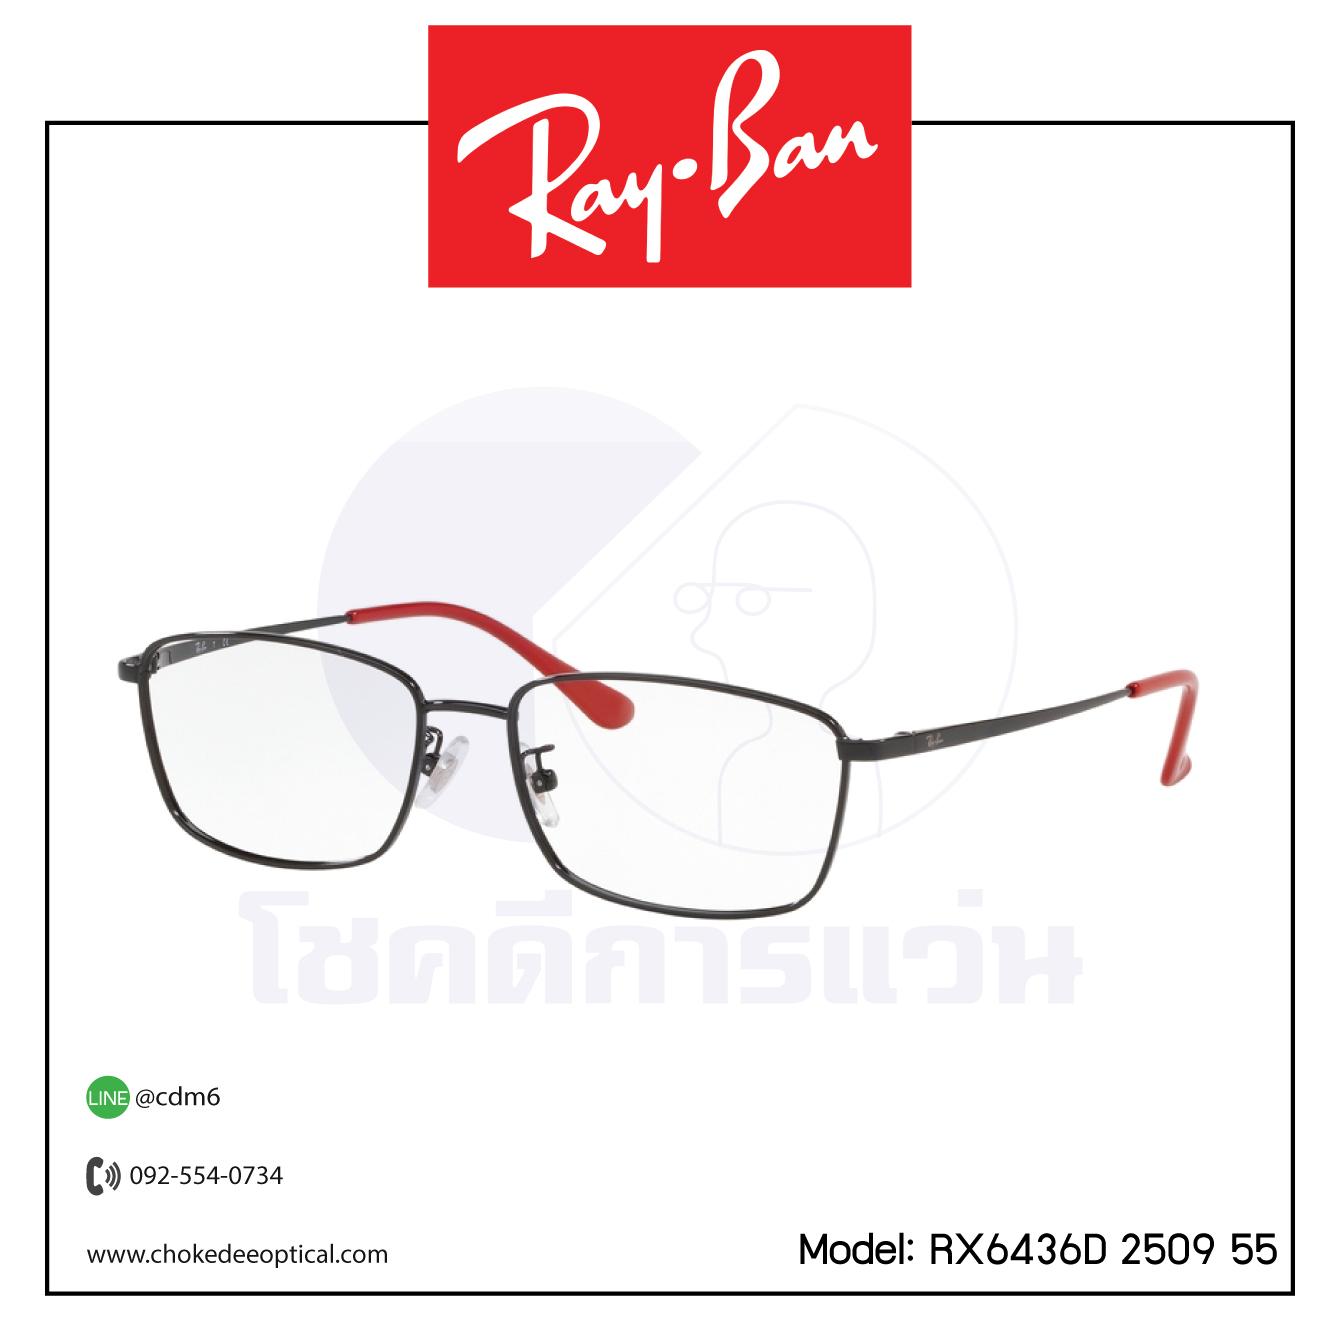 Rayban RX6436D 2509 55